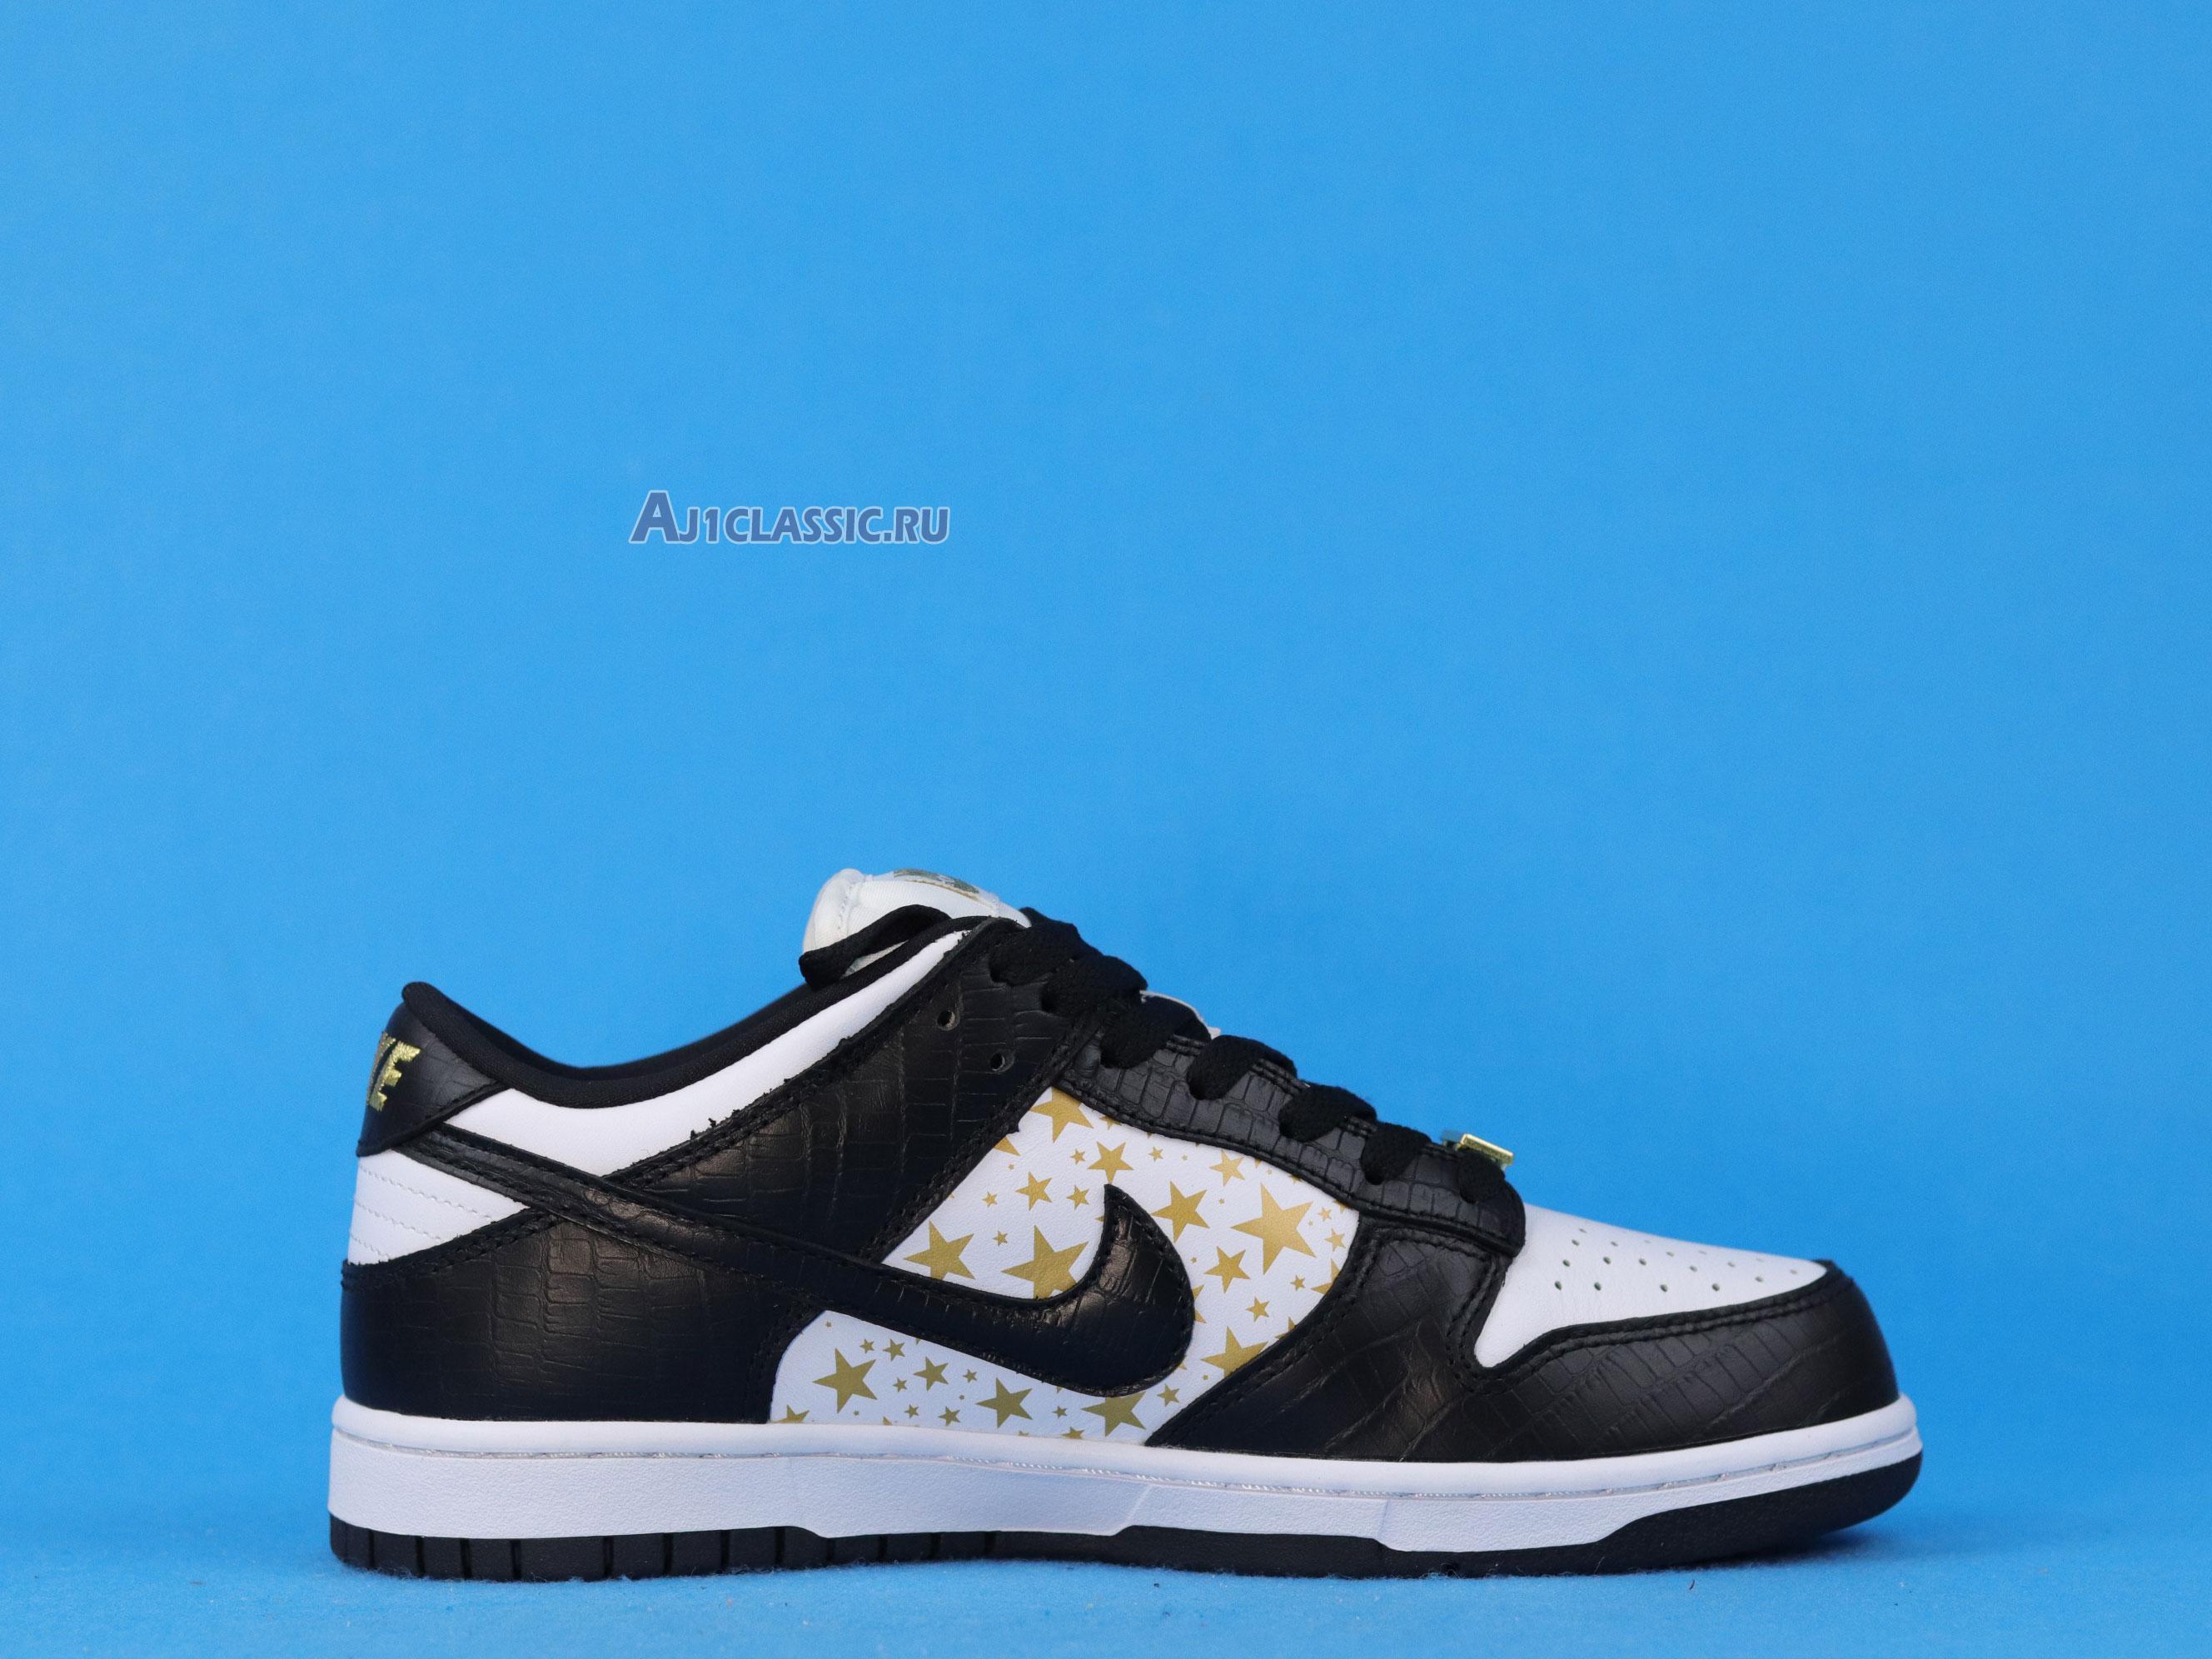 "Supreme x Nike Dunk Low OG SB QS ""Black"" DH3228-102"